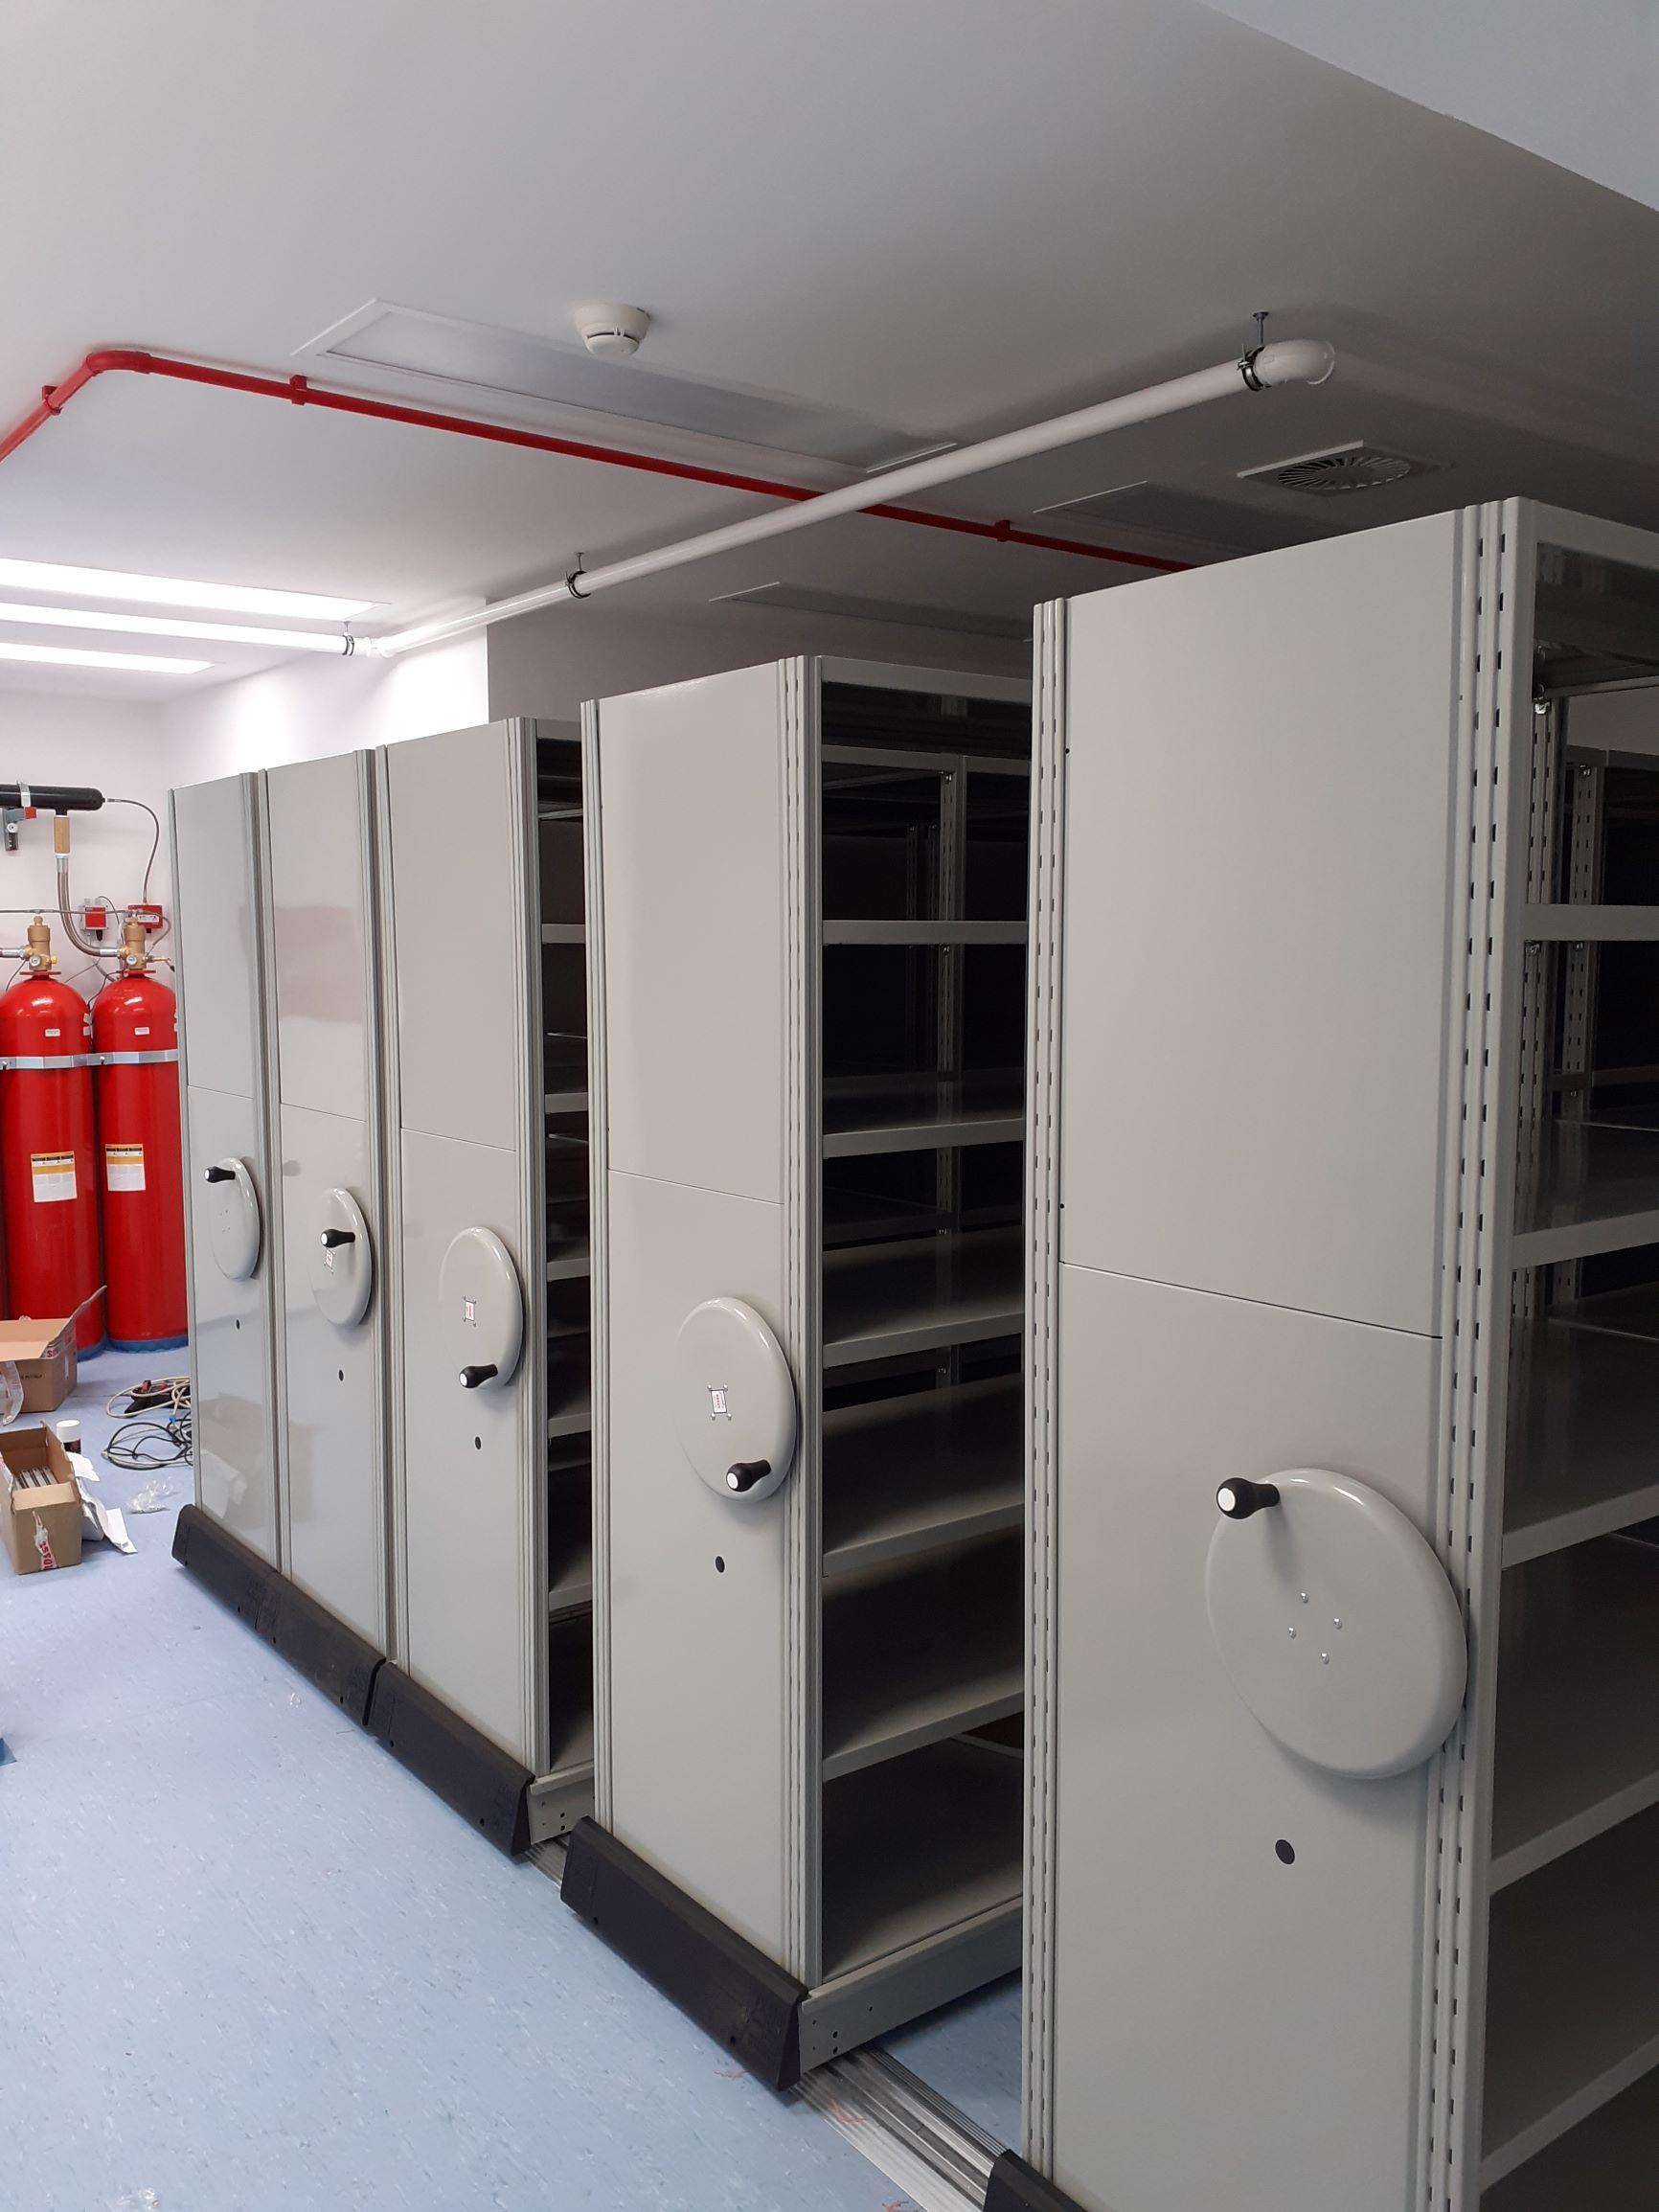 The future repository of the archives at Potočari. Photo: Azir Osmanovic